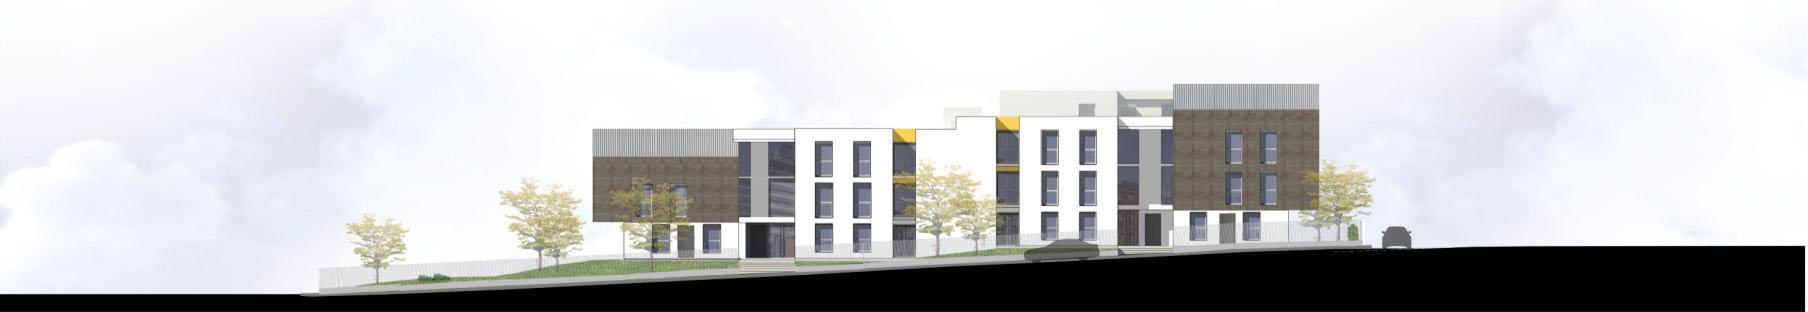 troyes_collective_housing_public_outdoor_design_christophe_gautrand_landscape_4.jpg